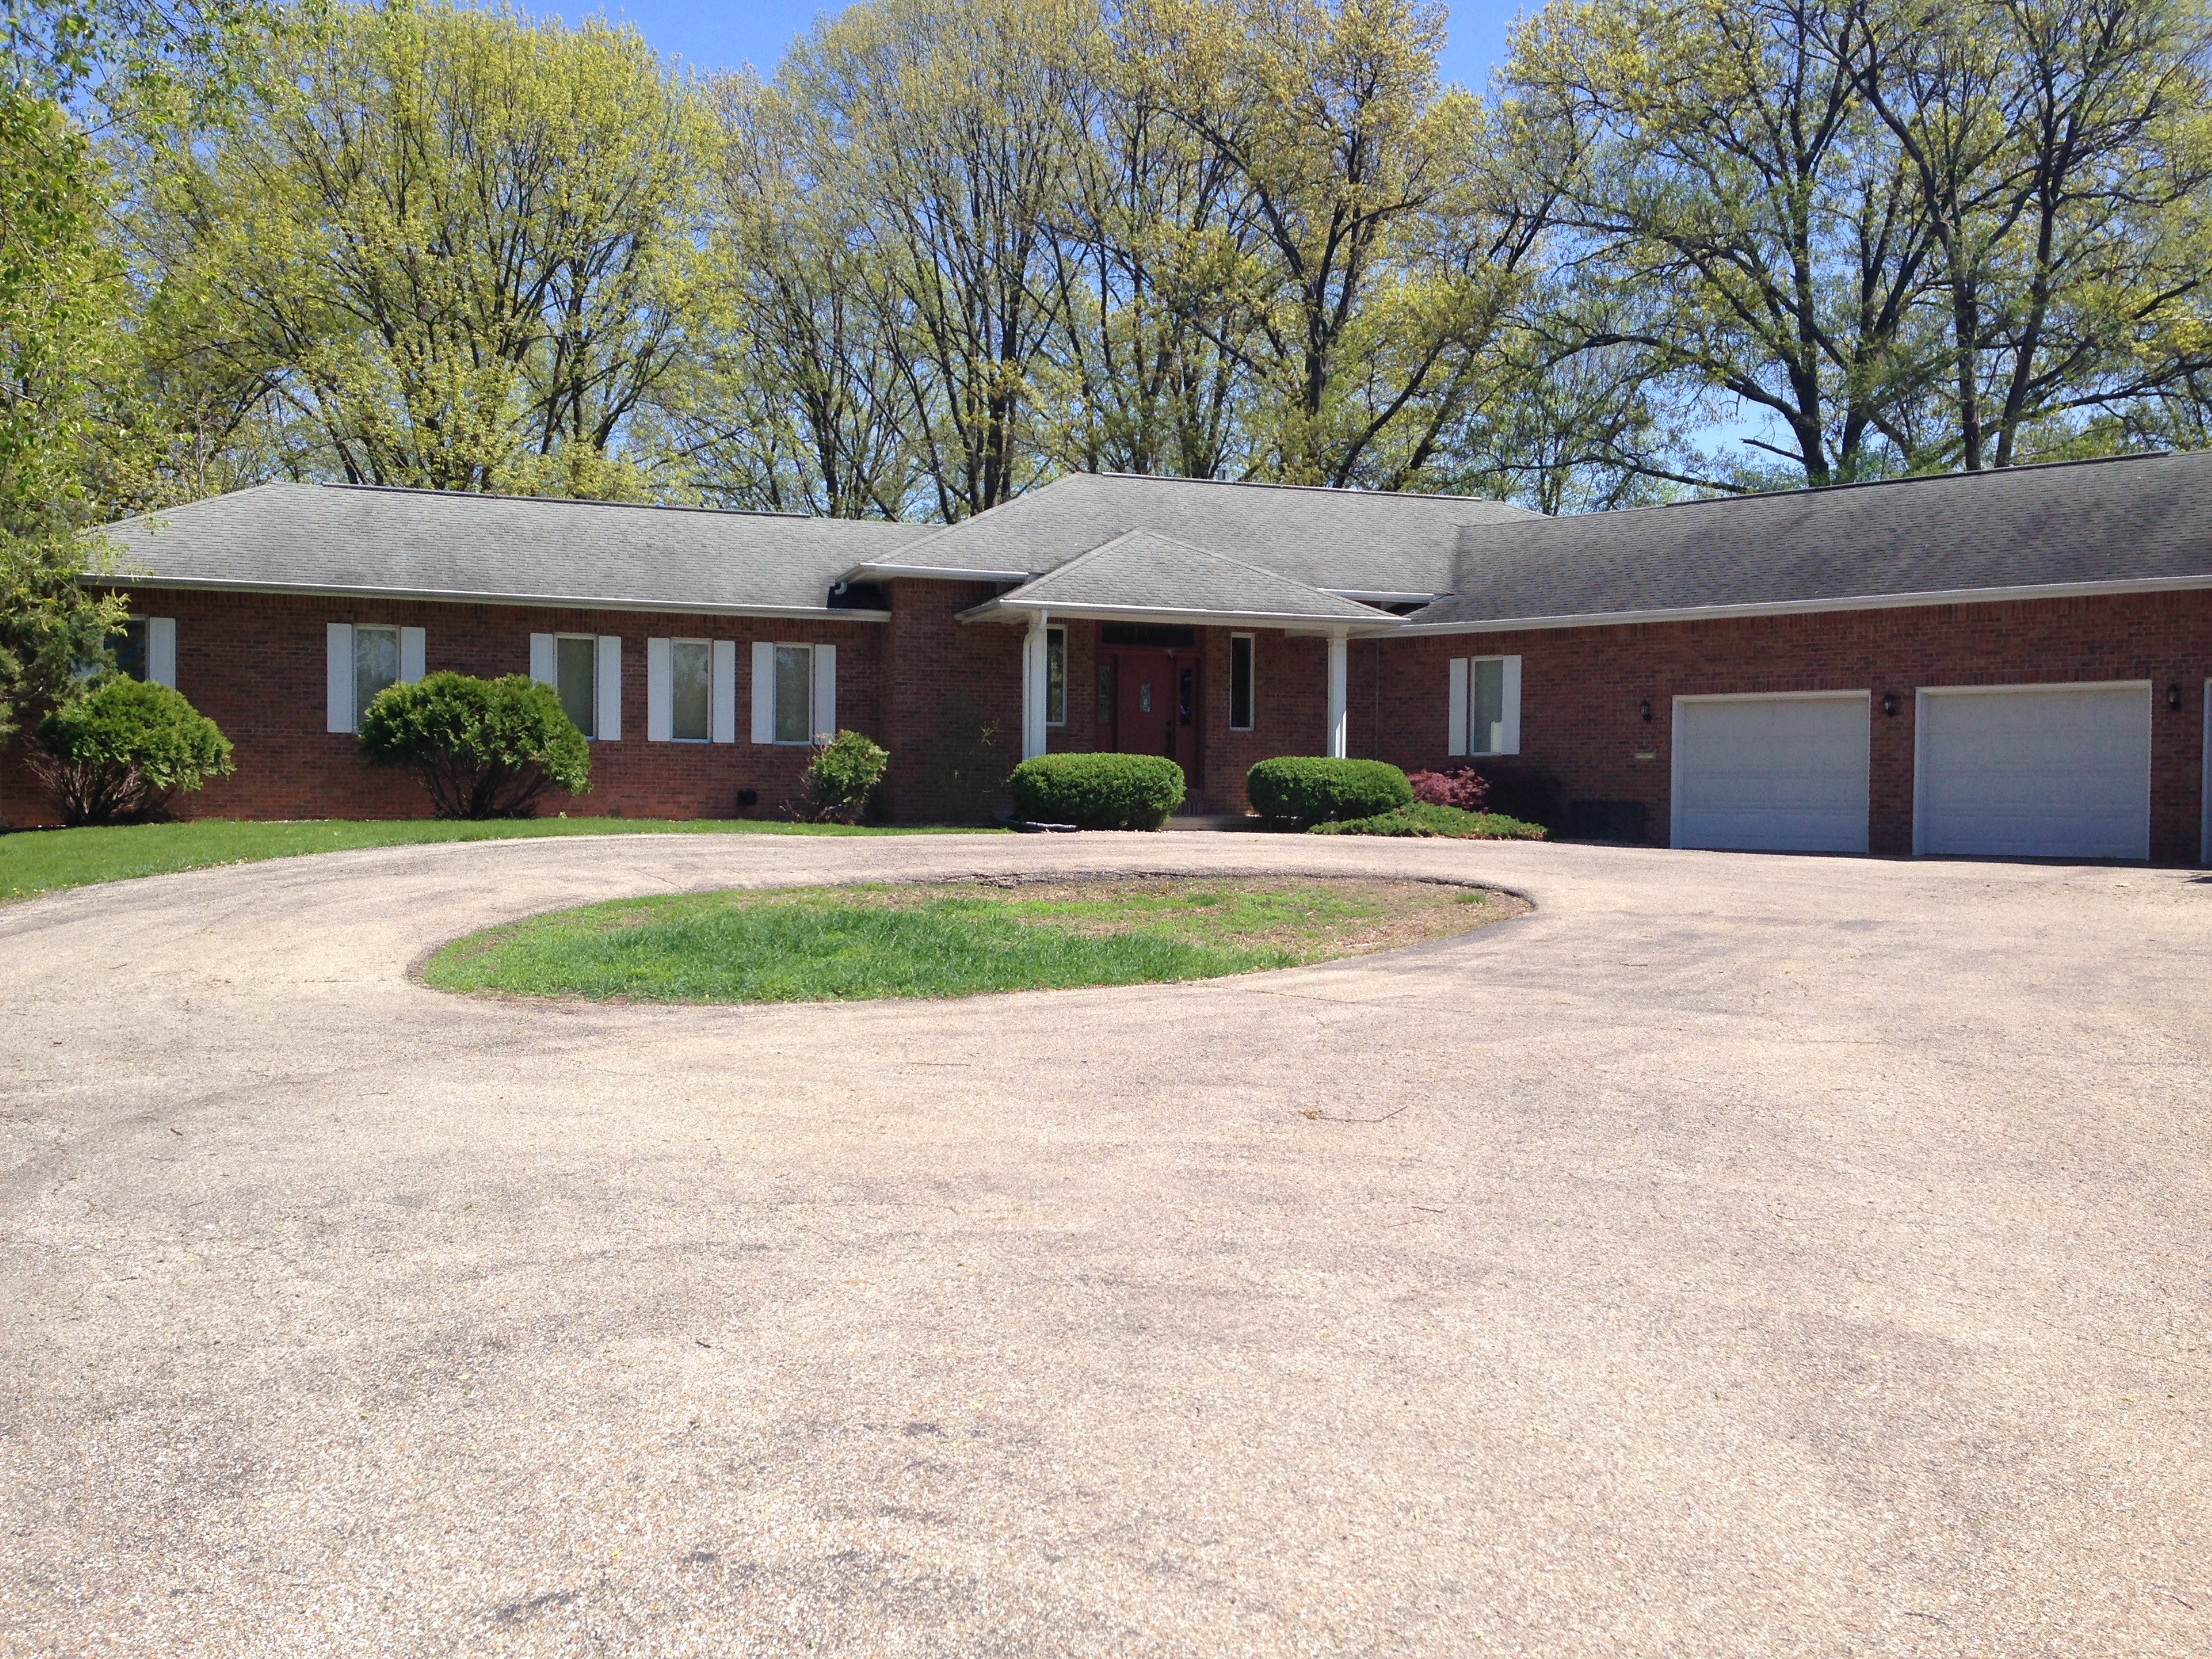 405 S. Pearl, Macomb, Illinois 61455